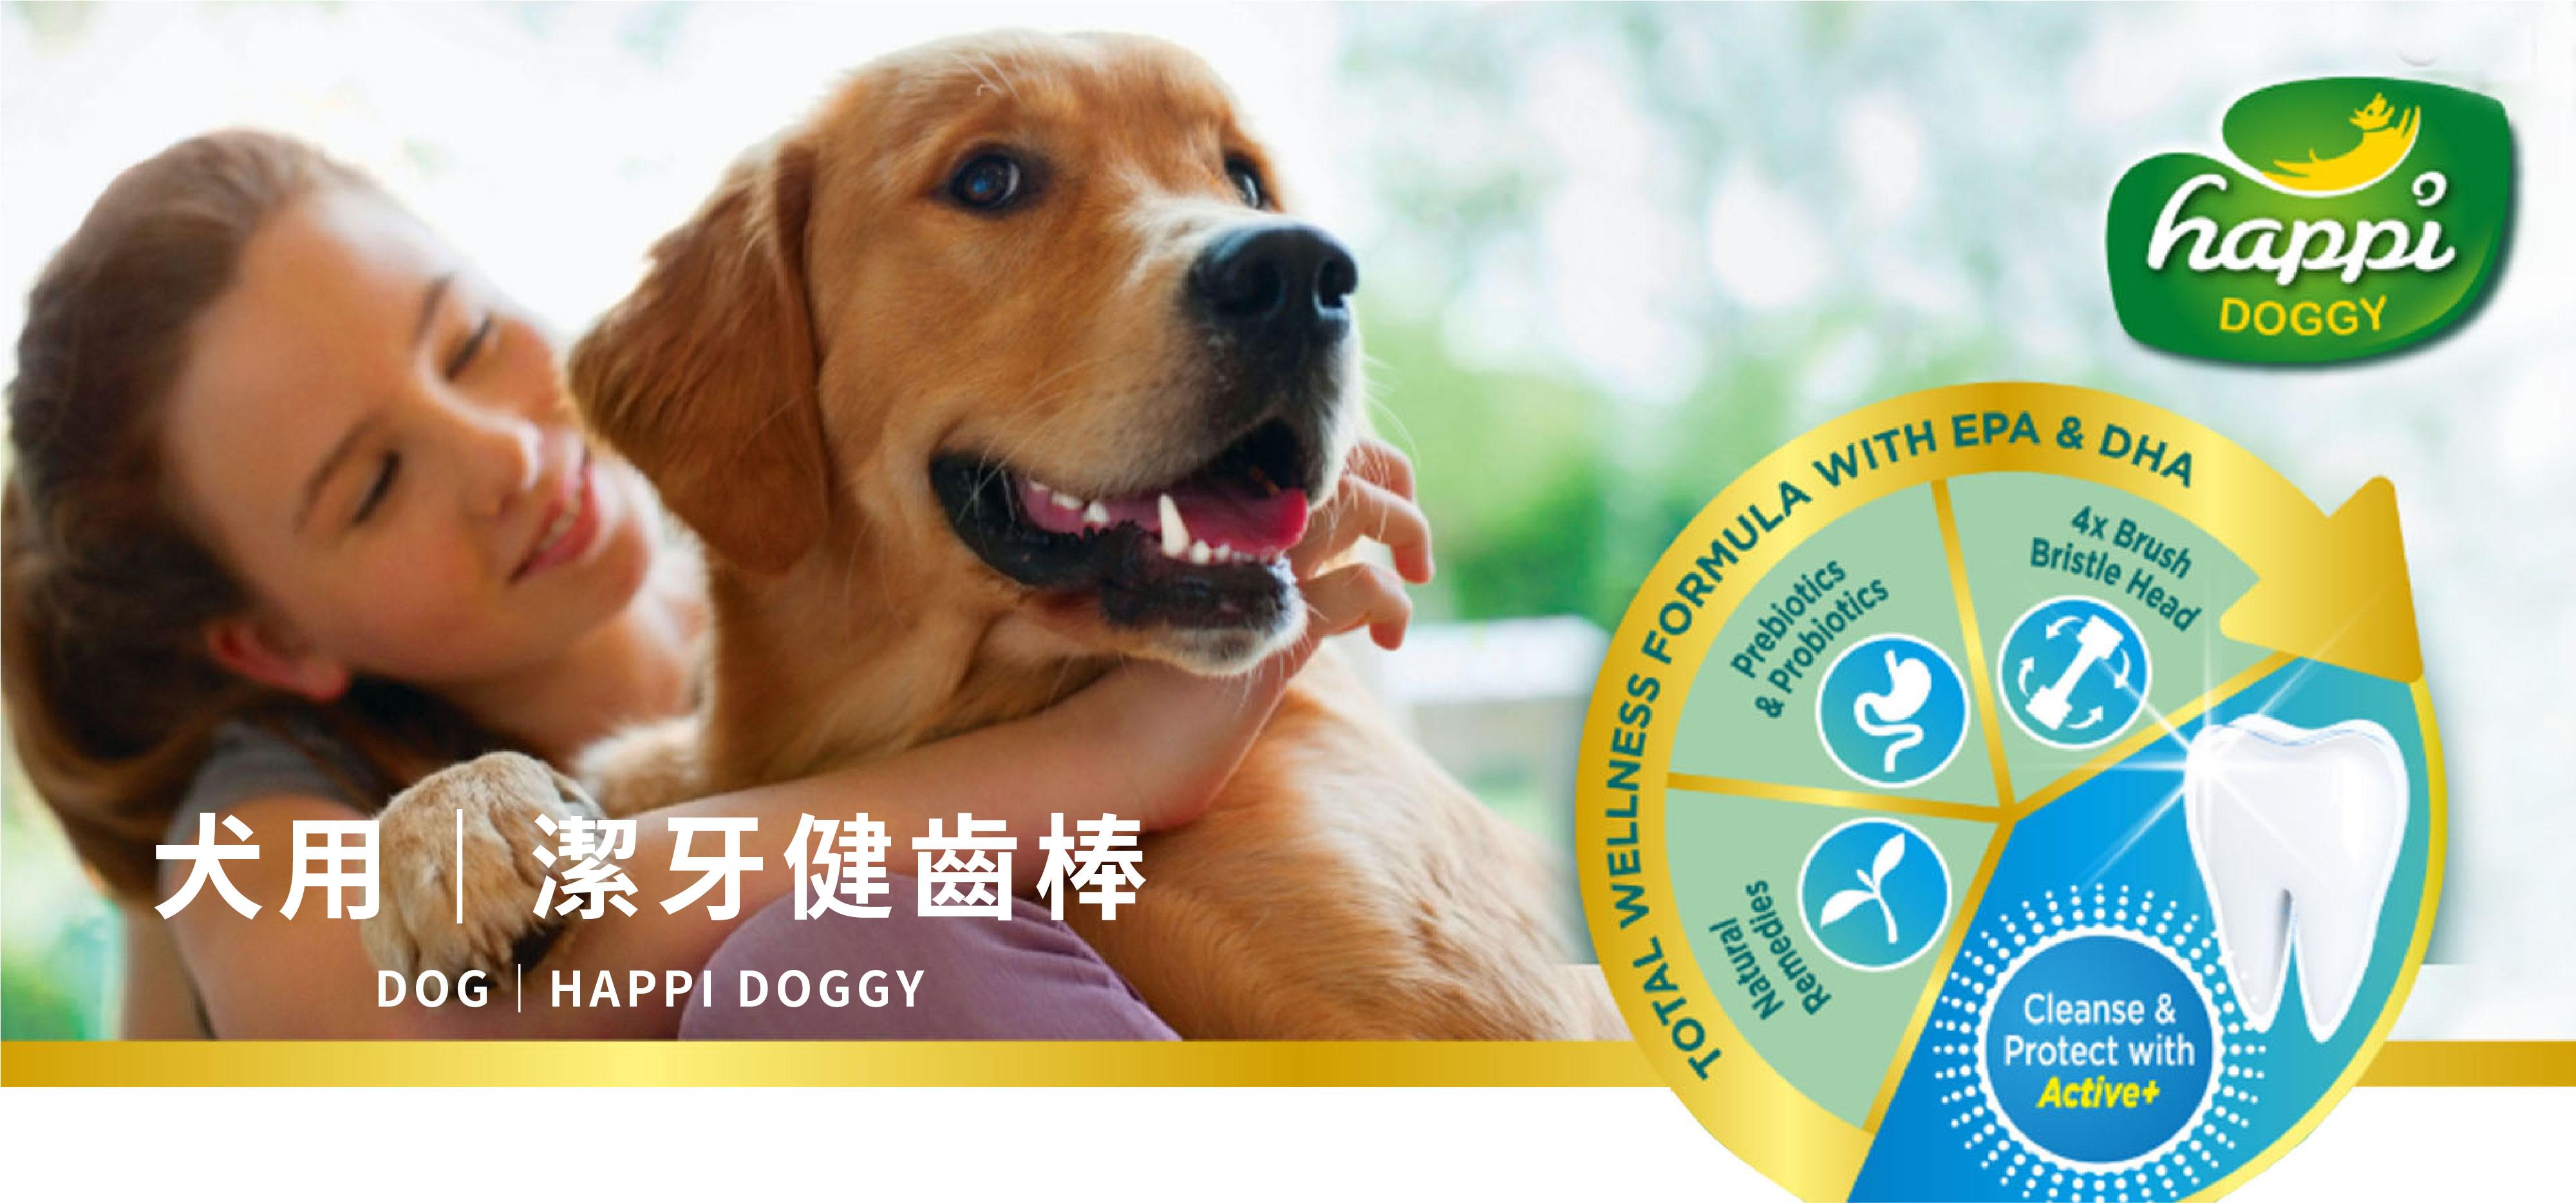 HAPPI DOGGY_寵物潔牙骨